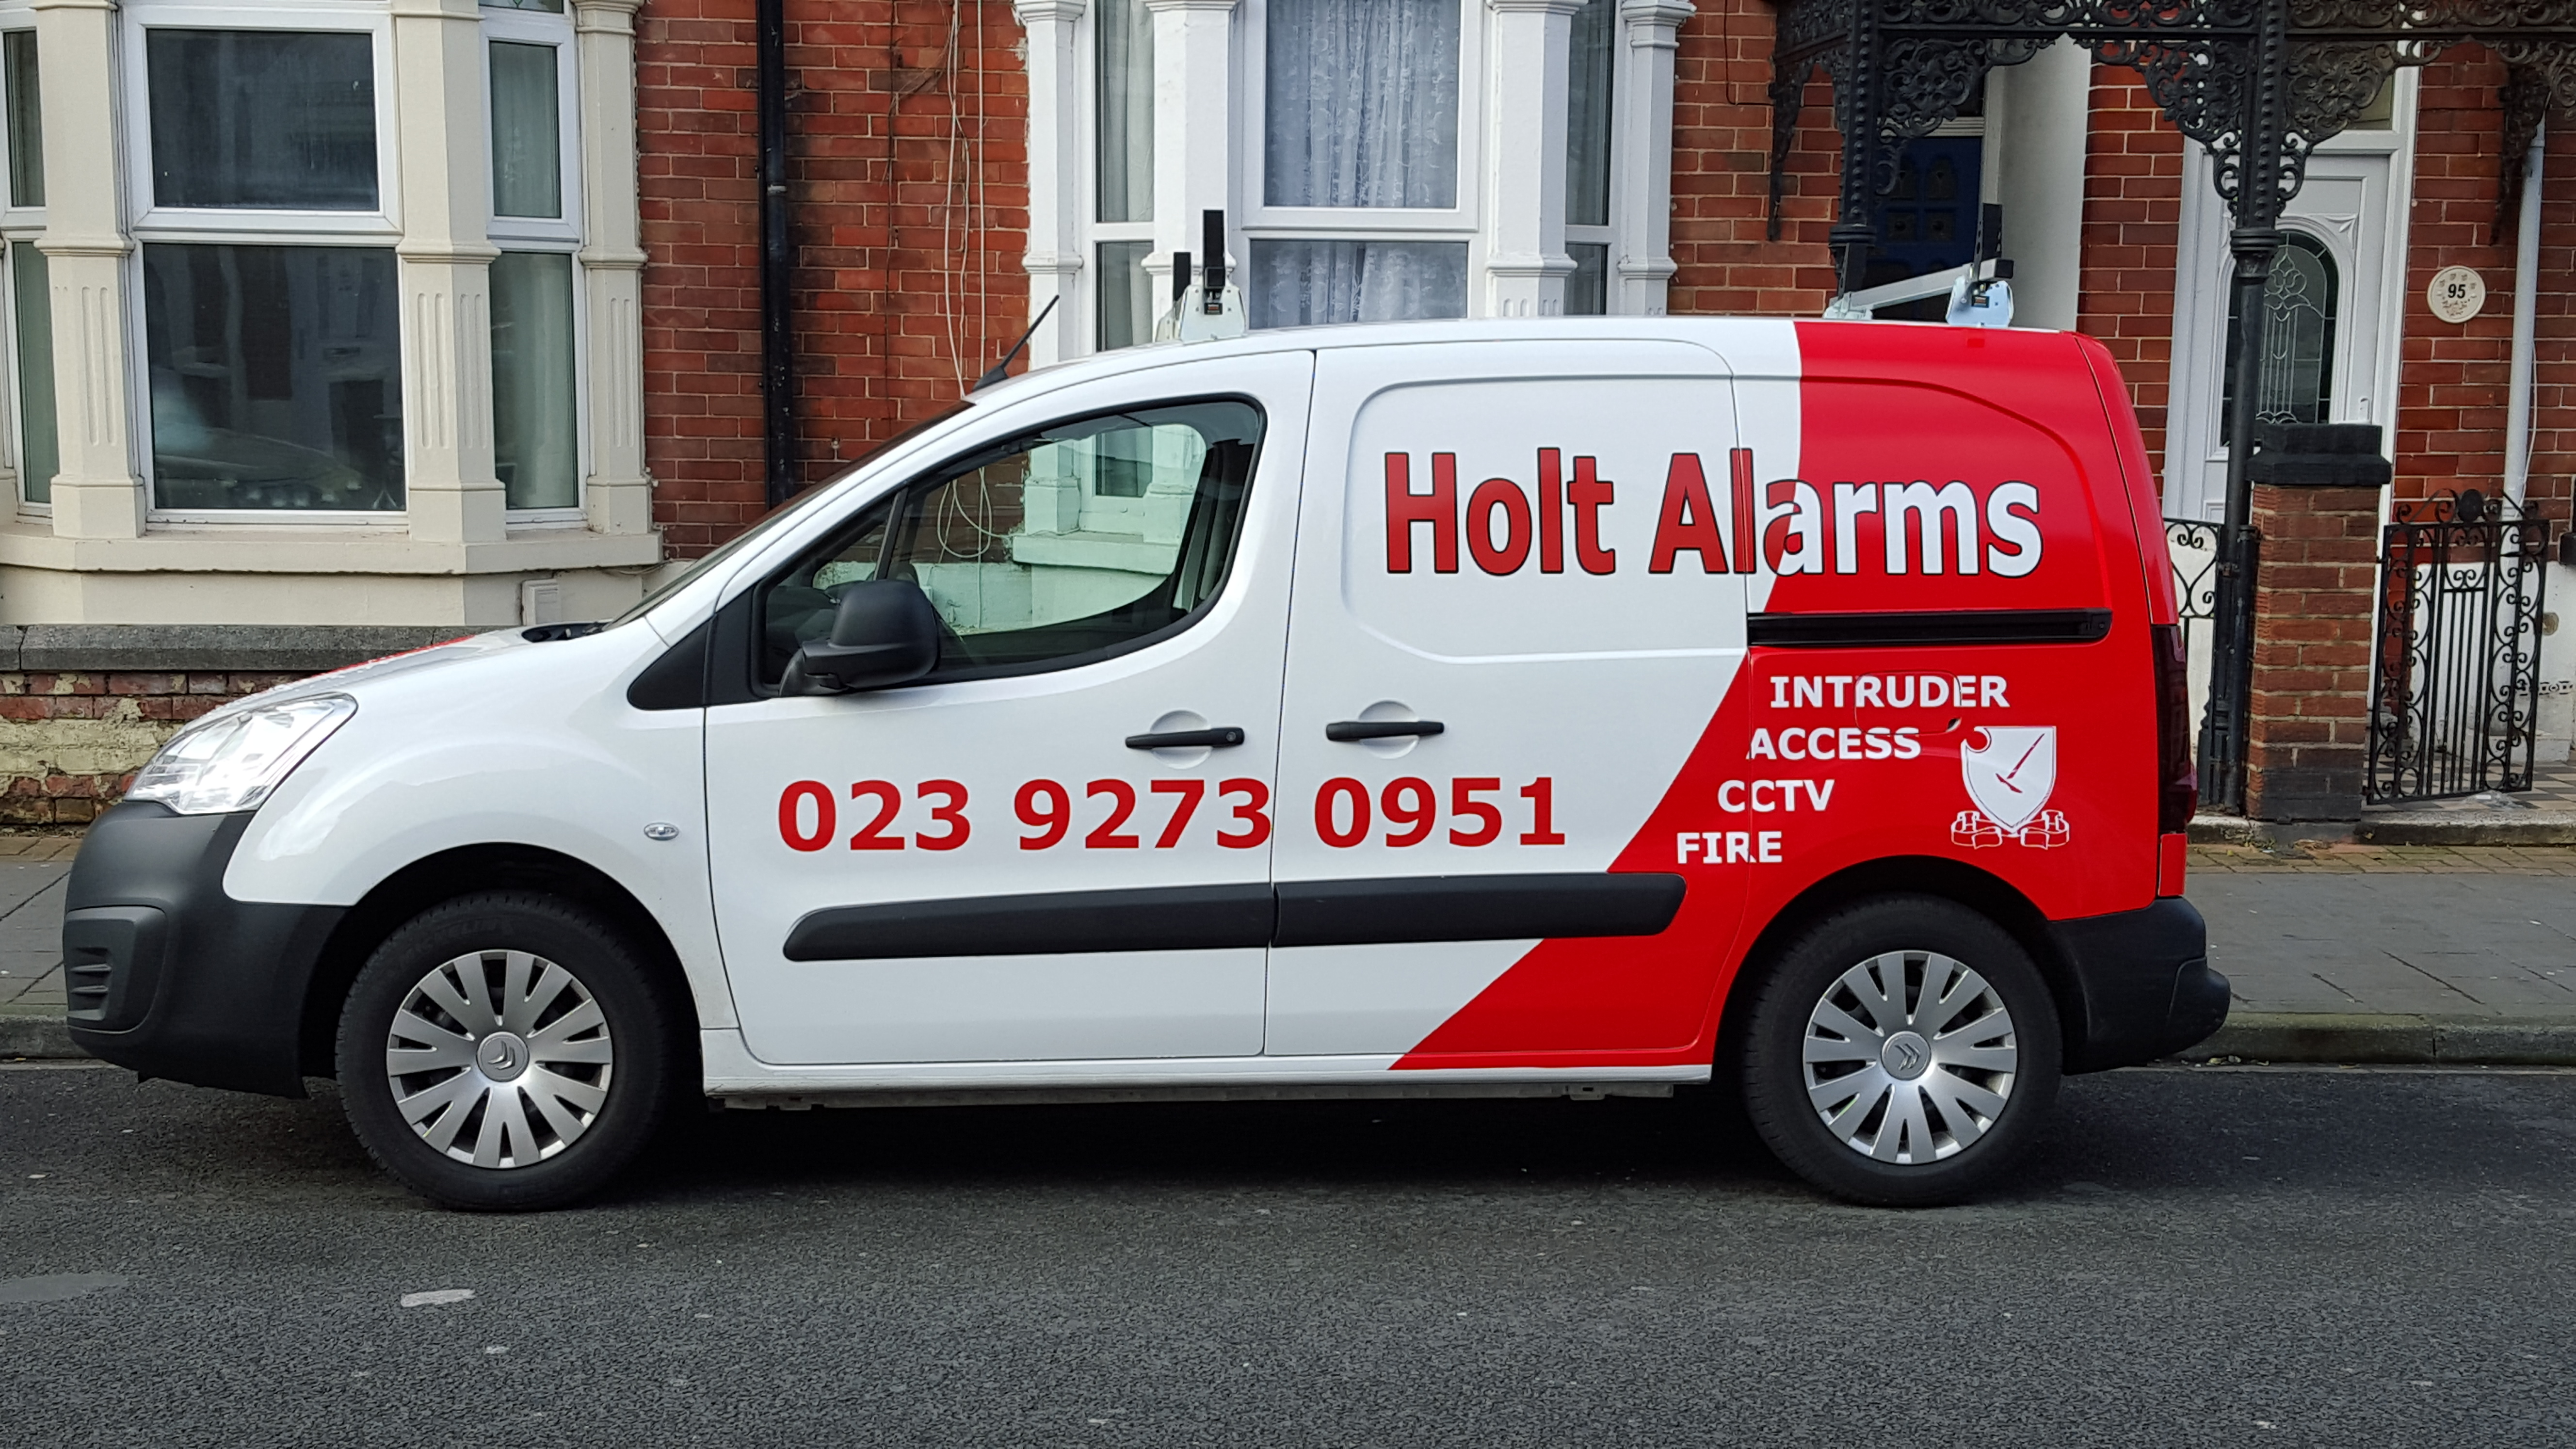 Holt Alarms Van